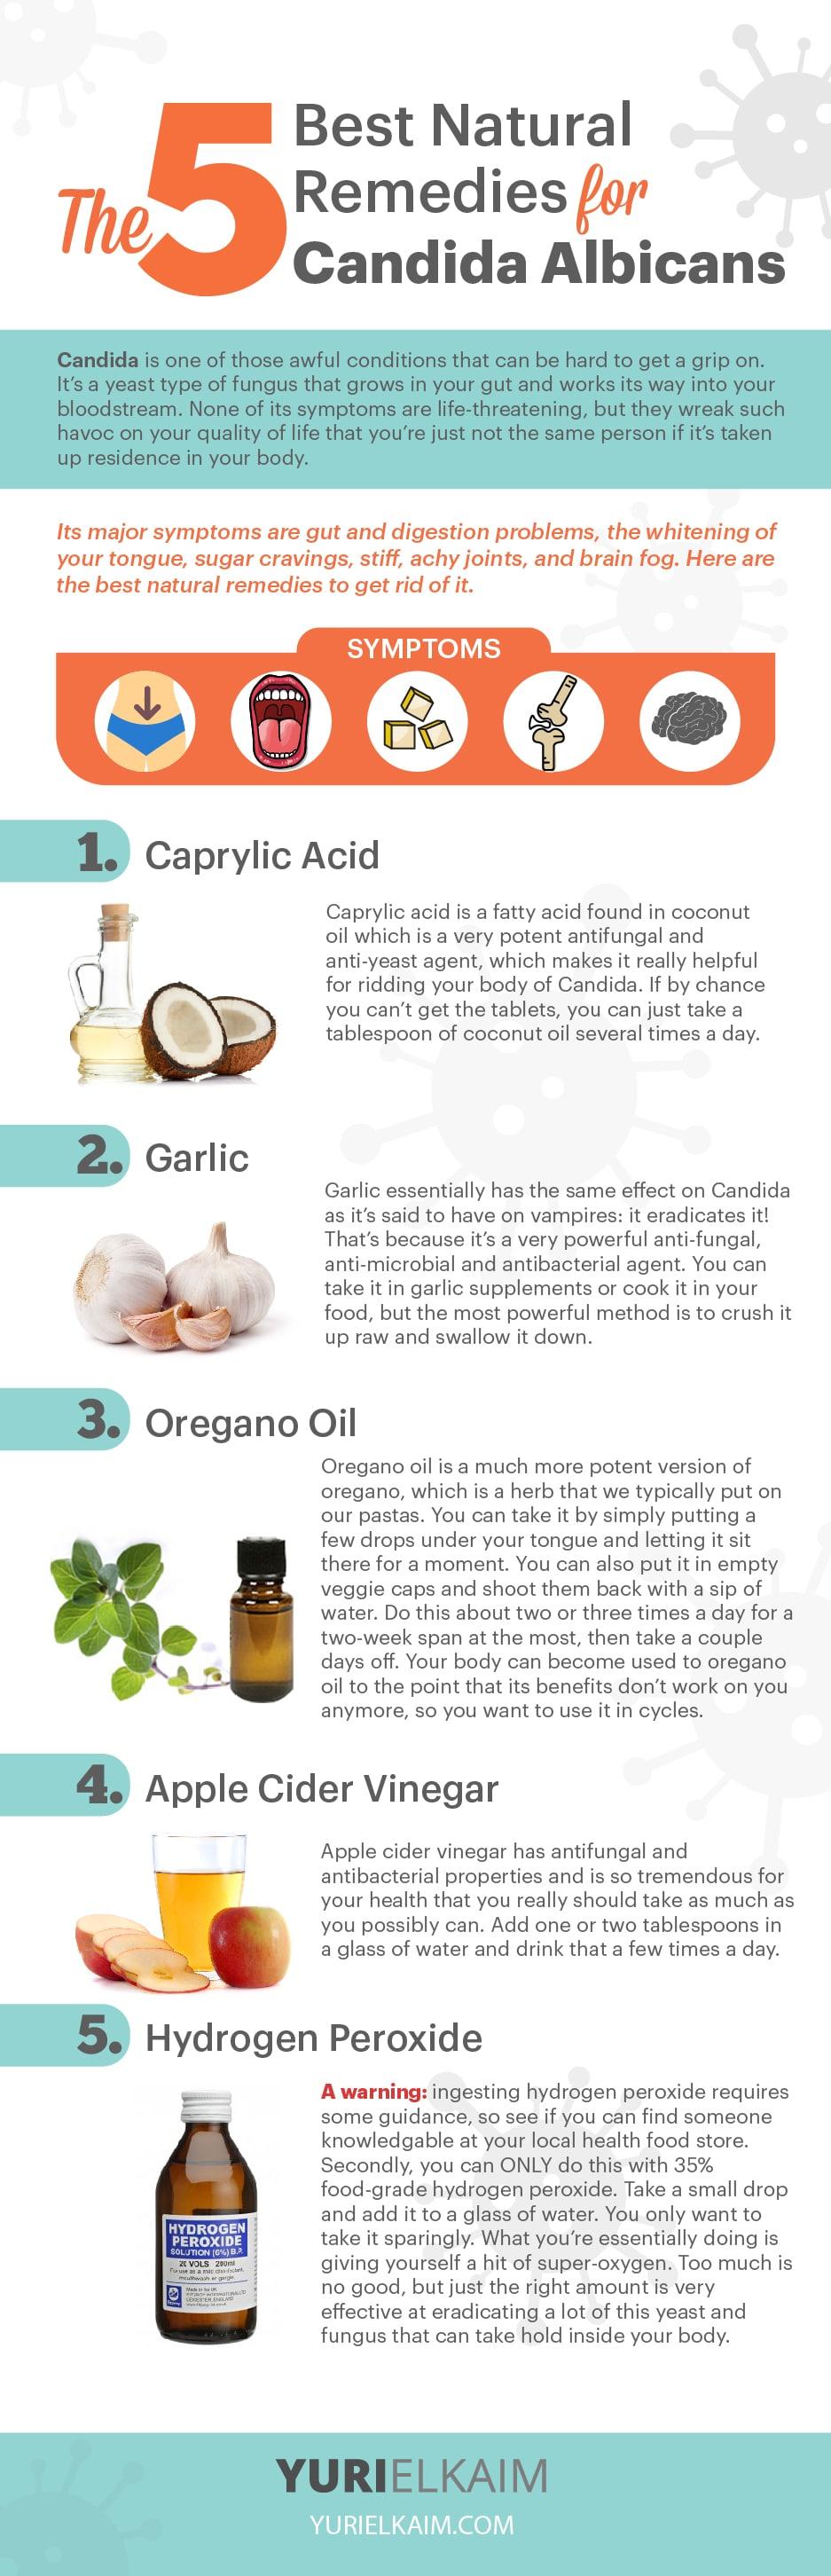 Choosing a good remedy for thrush